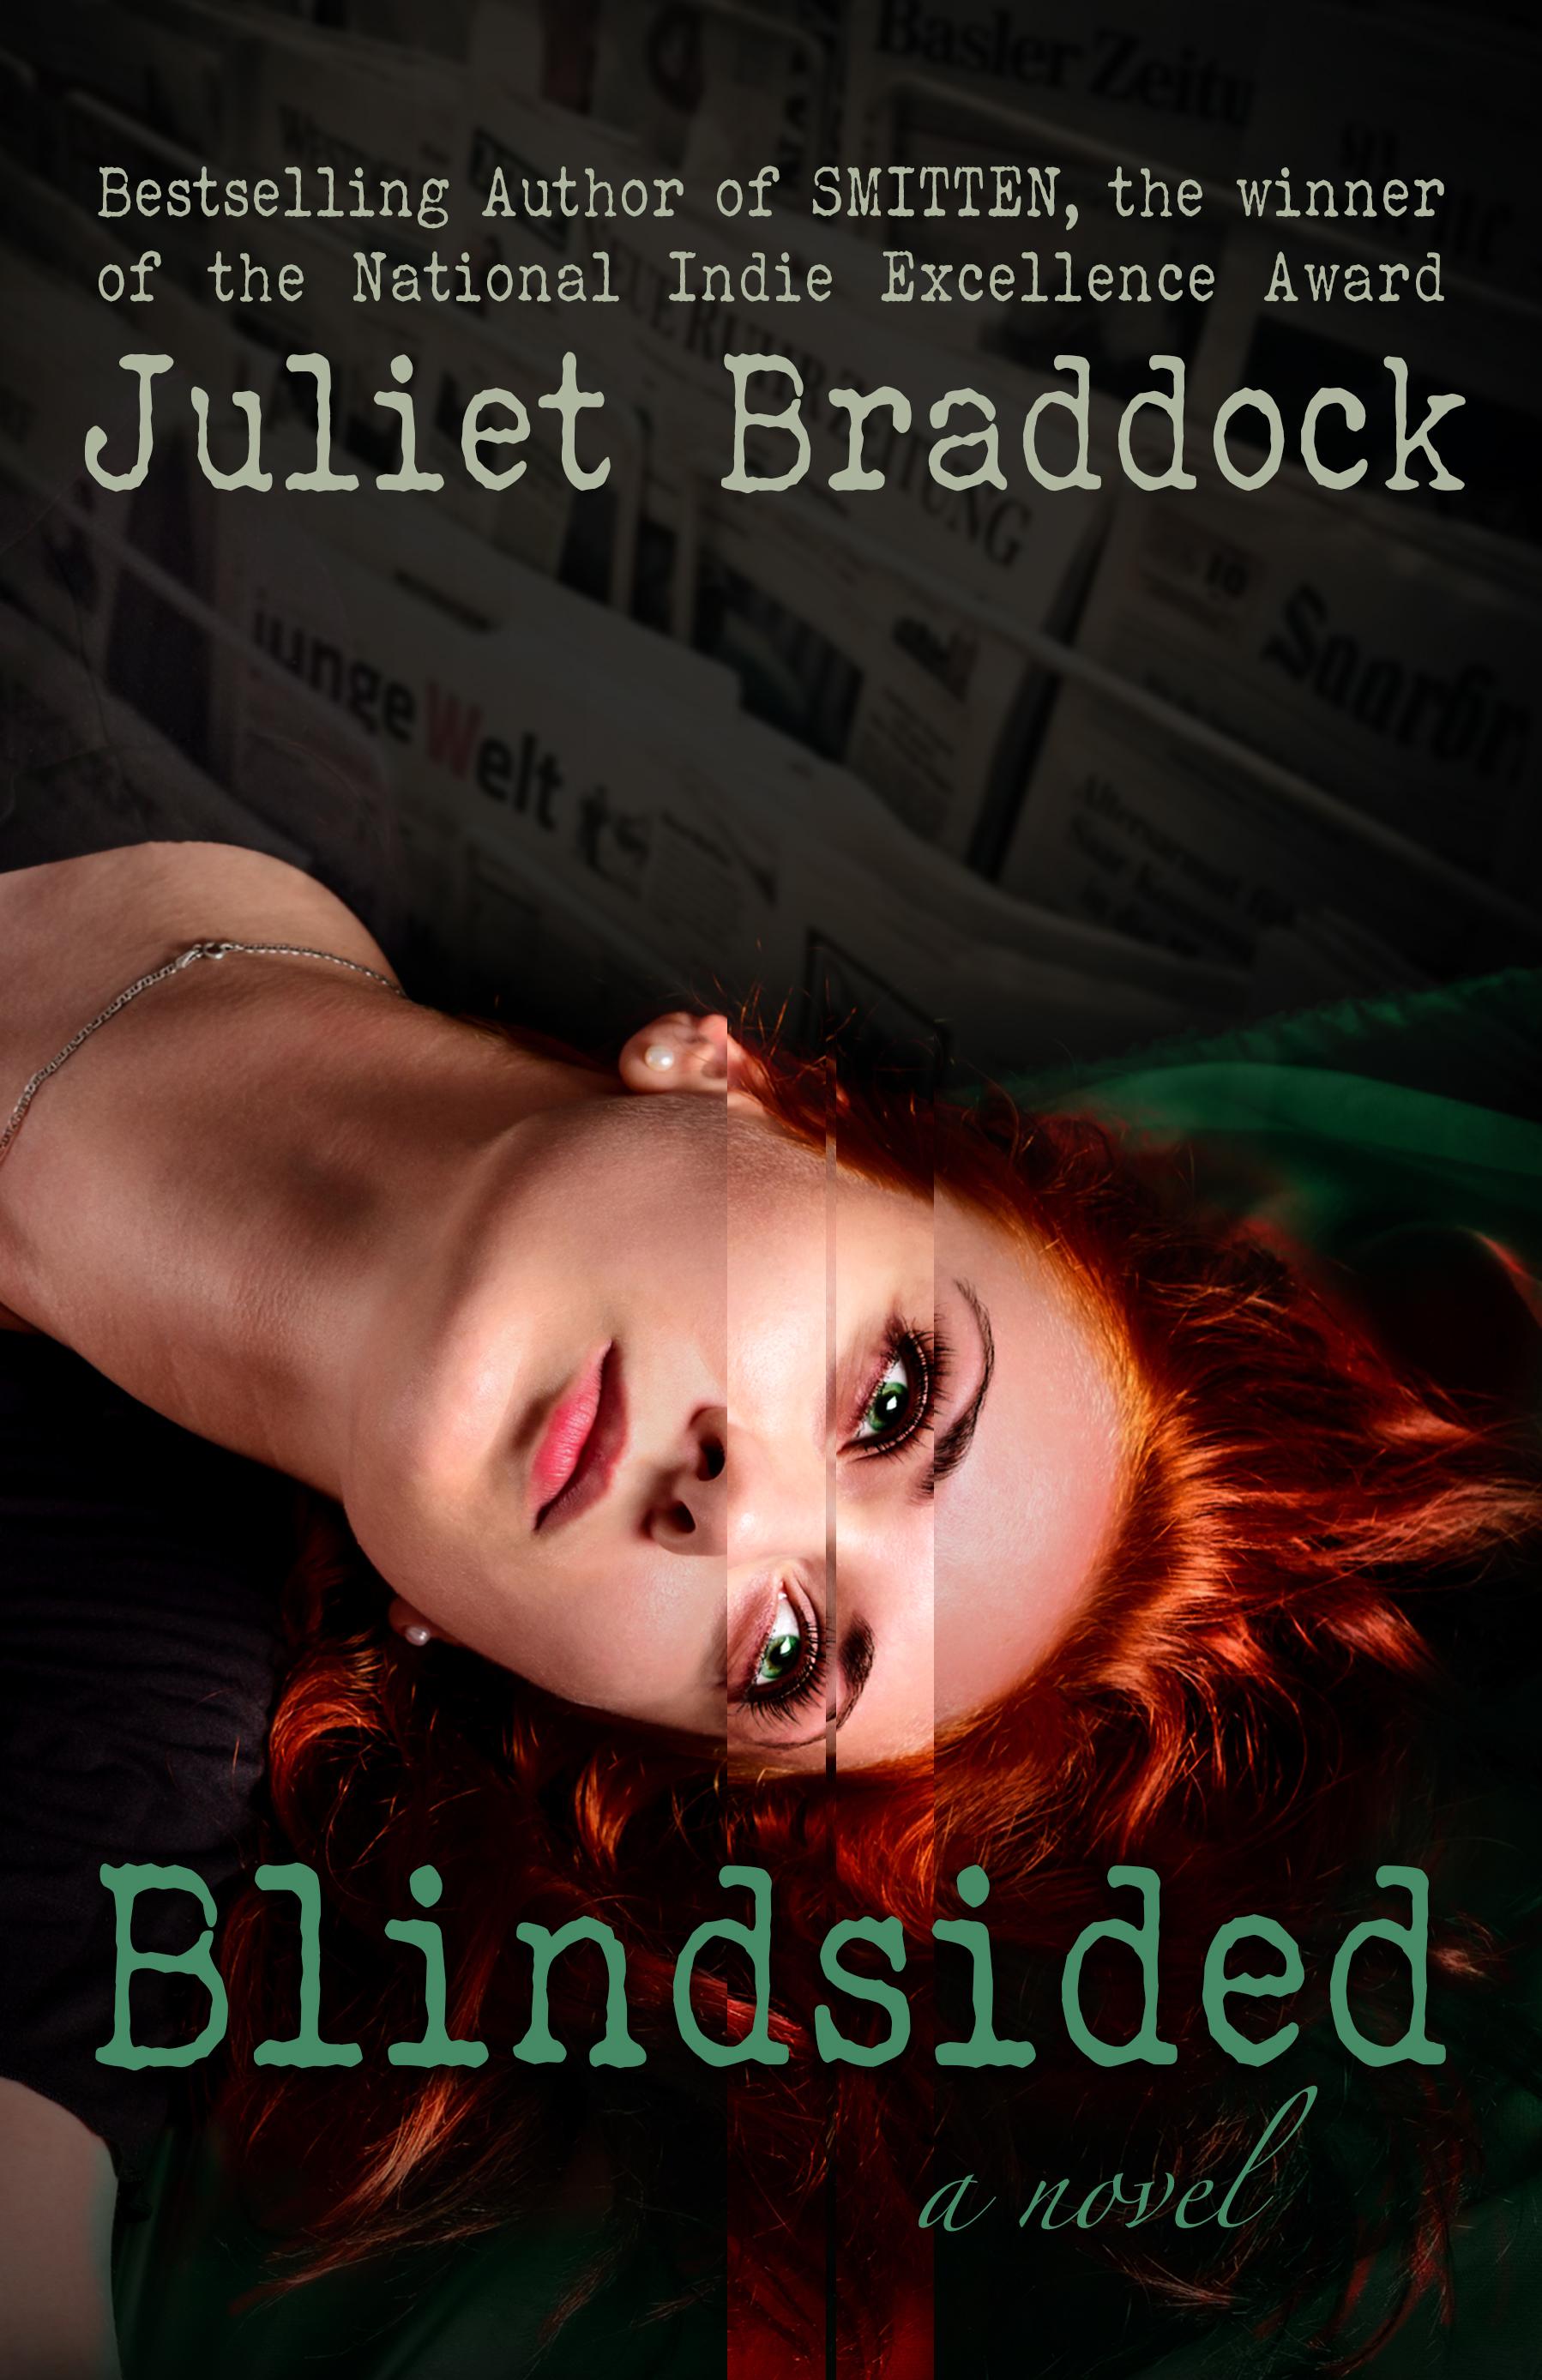 blindsided_front_cover_07_19